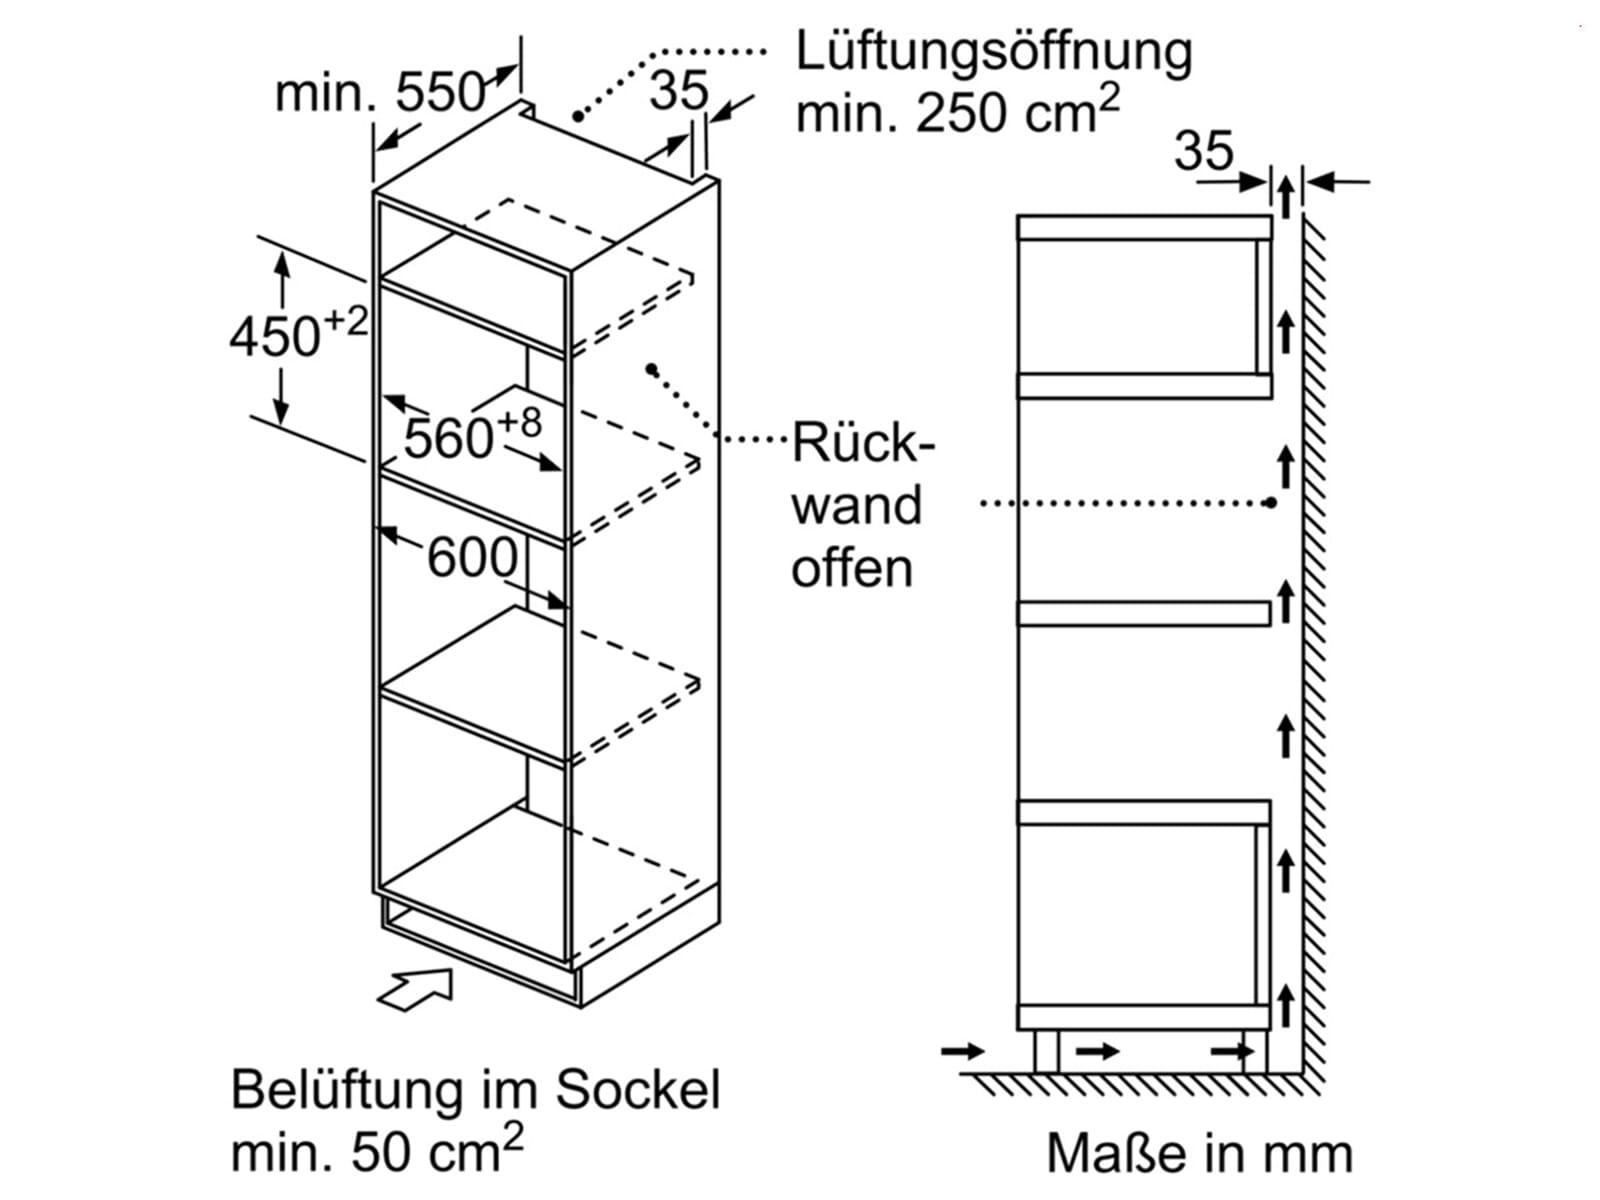 bosch cma585ms0 kompaktbackofen mit mikrowelle edelstahl. Black Bedroom Furniture Sets. Home Design Ideas